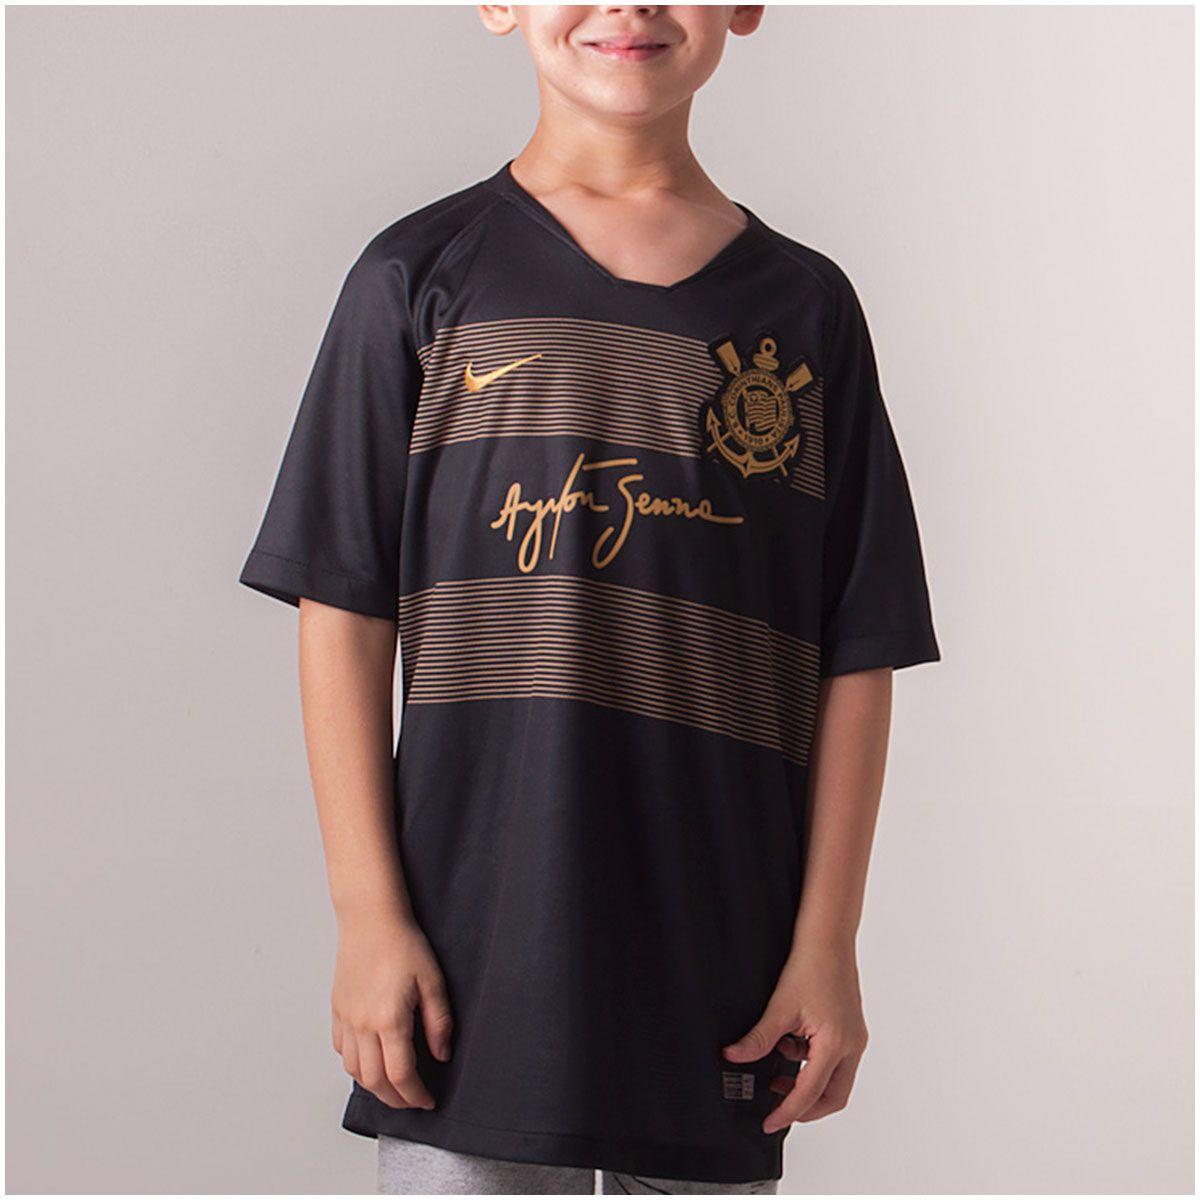 6be19029fe Camisa Corinthians III Nike Senna 2018 19 Infantil